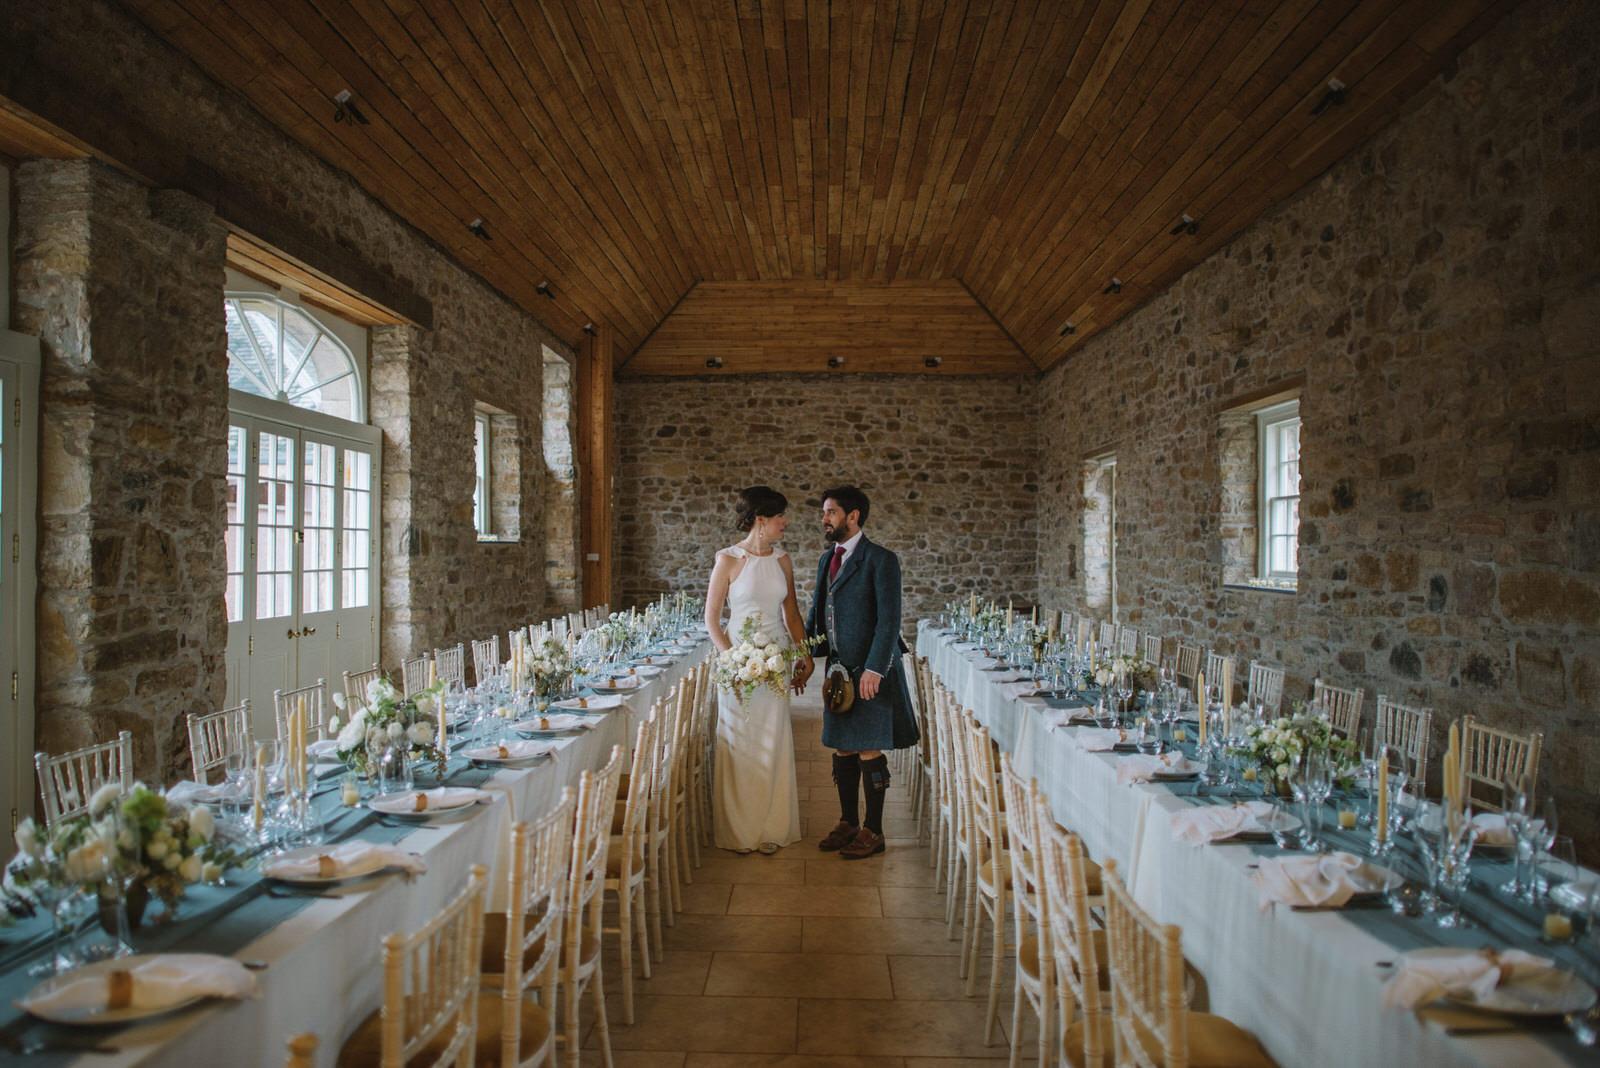 020-COLSTOUN-HOUSE-WEDDING-ALTERNATIVE-WEDDING-PHOTOGRAPHER-GLASGOW-WEDDING-PHOTOGRAPHER-STYLISH-SCOTTISH-WEDDING.JPG